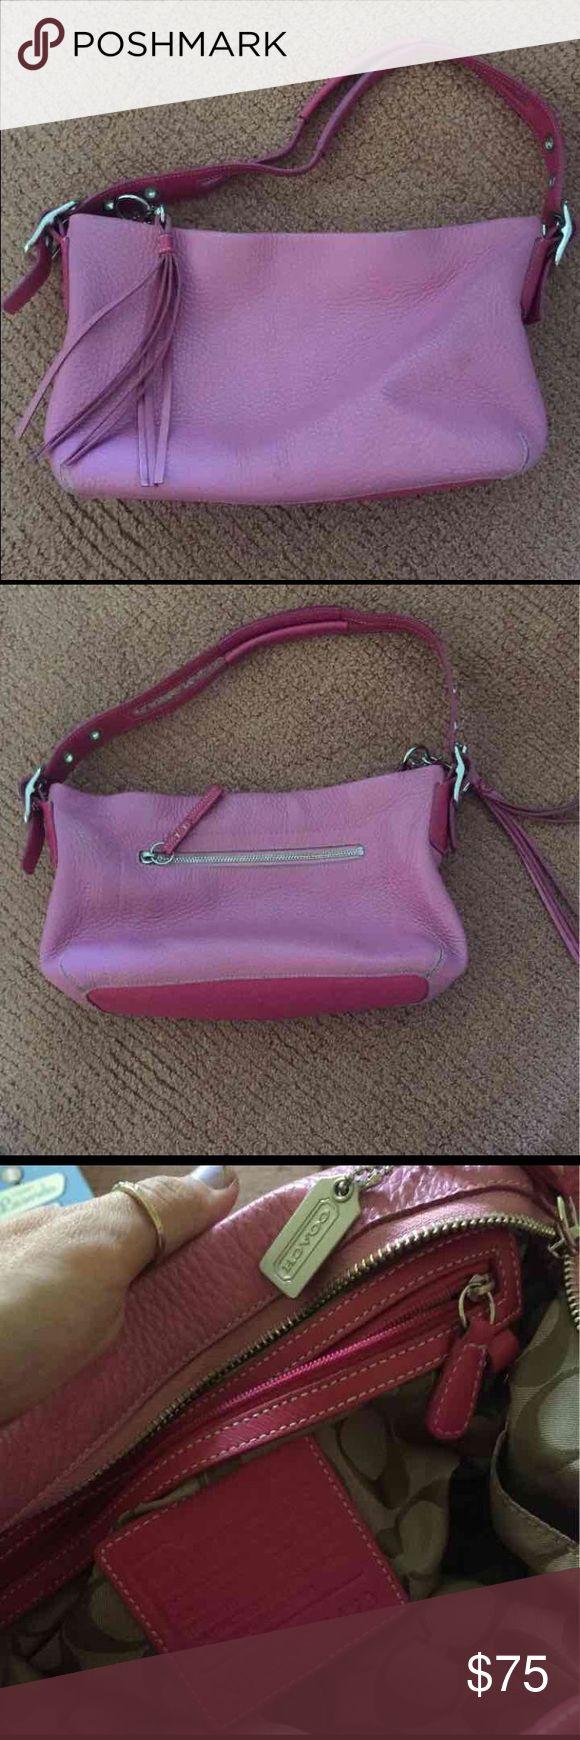 17 best ideas about pink coach purses on pinterest purse. Black Bedroom Furniture Sets. Home Design Ideas